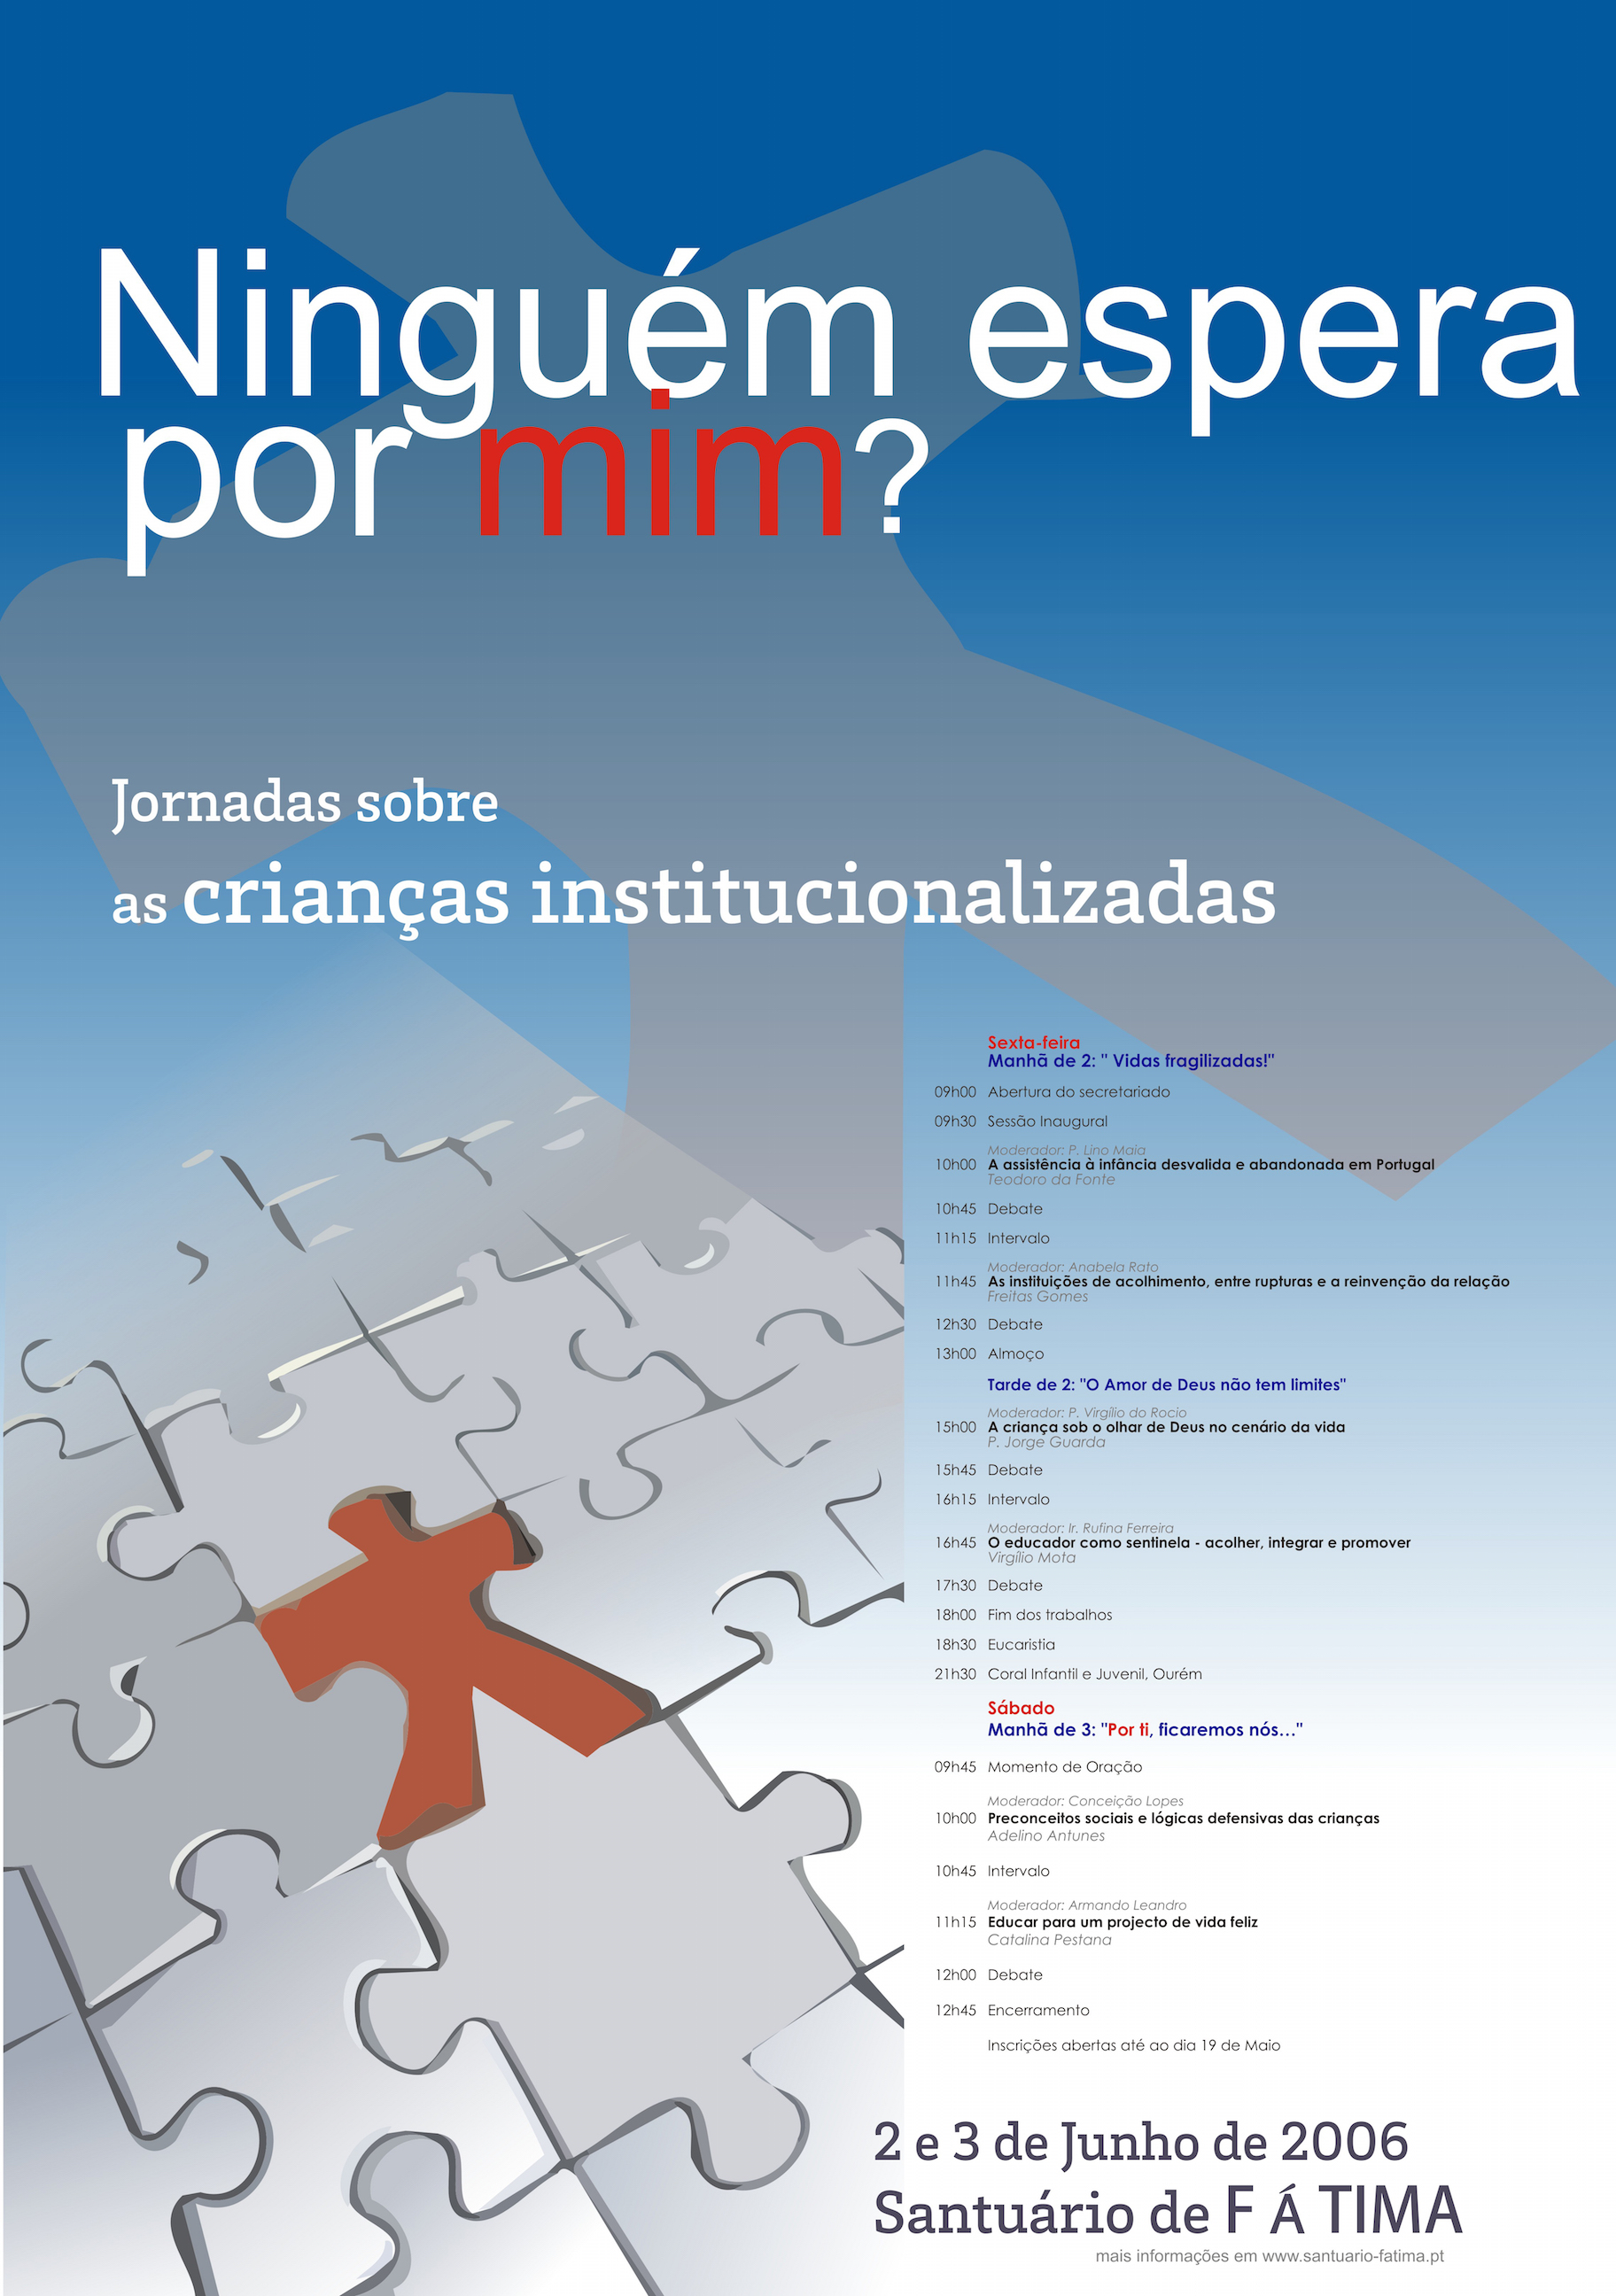 Jornadas 2006 Ninguem espera_cartaz.jpg